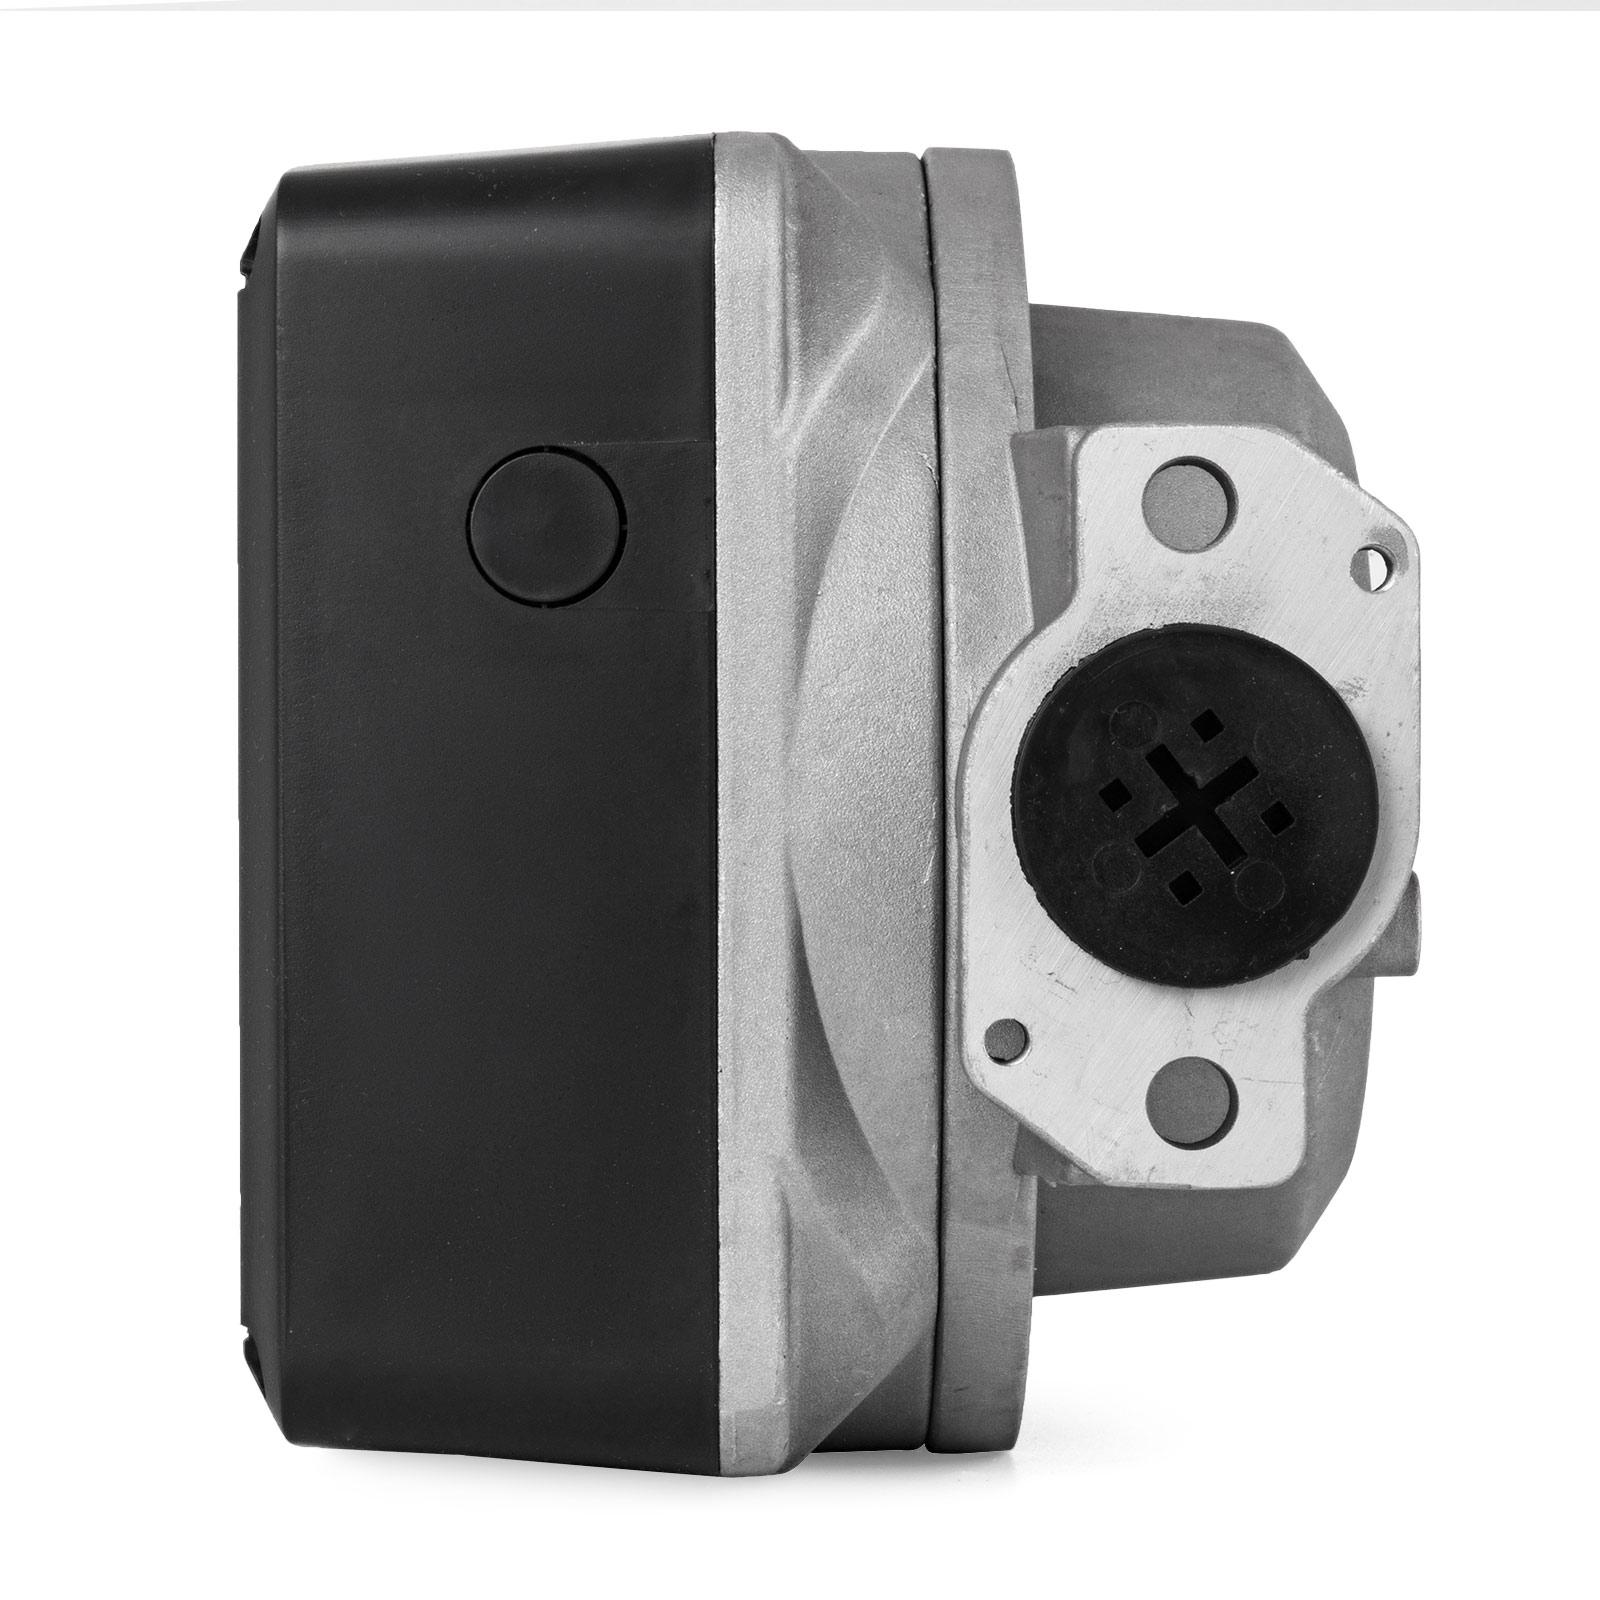 Fuel Meter Gas Mechanical Gallon Tracking Flow Sensor Measurement 4 Digit New